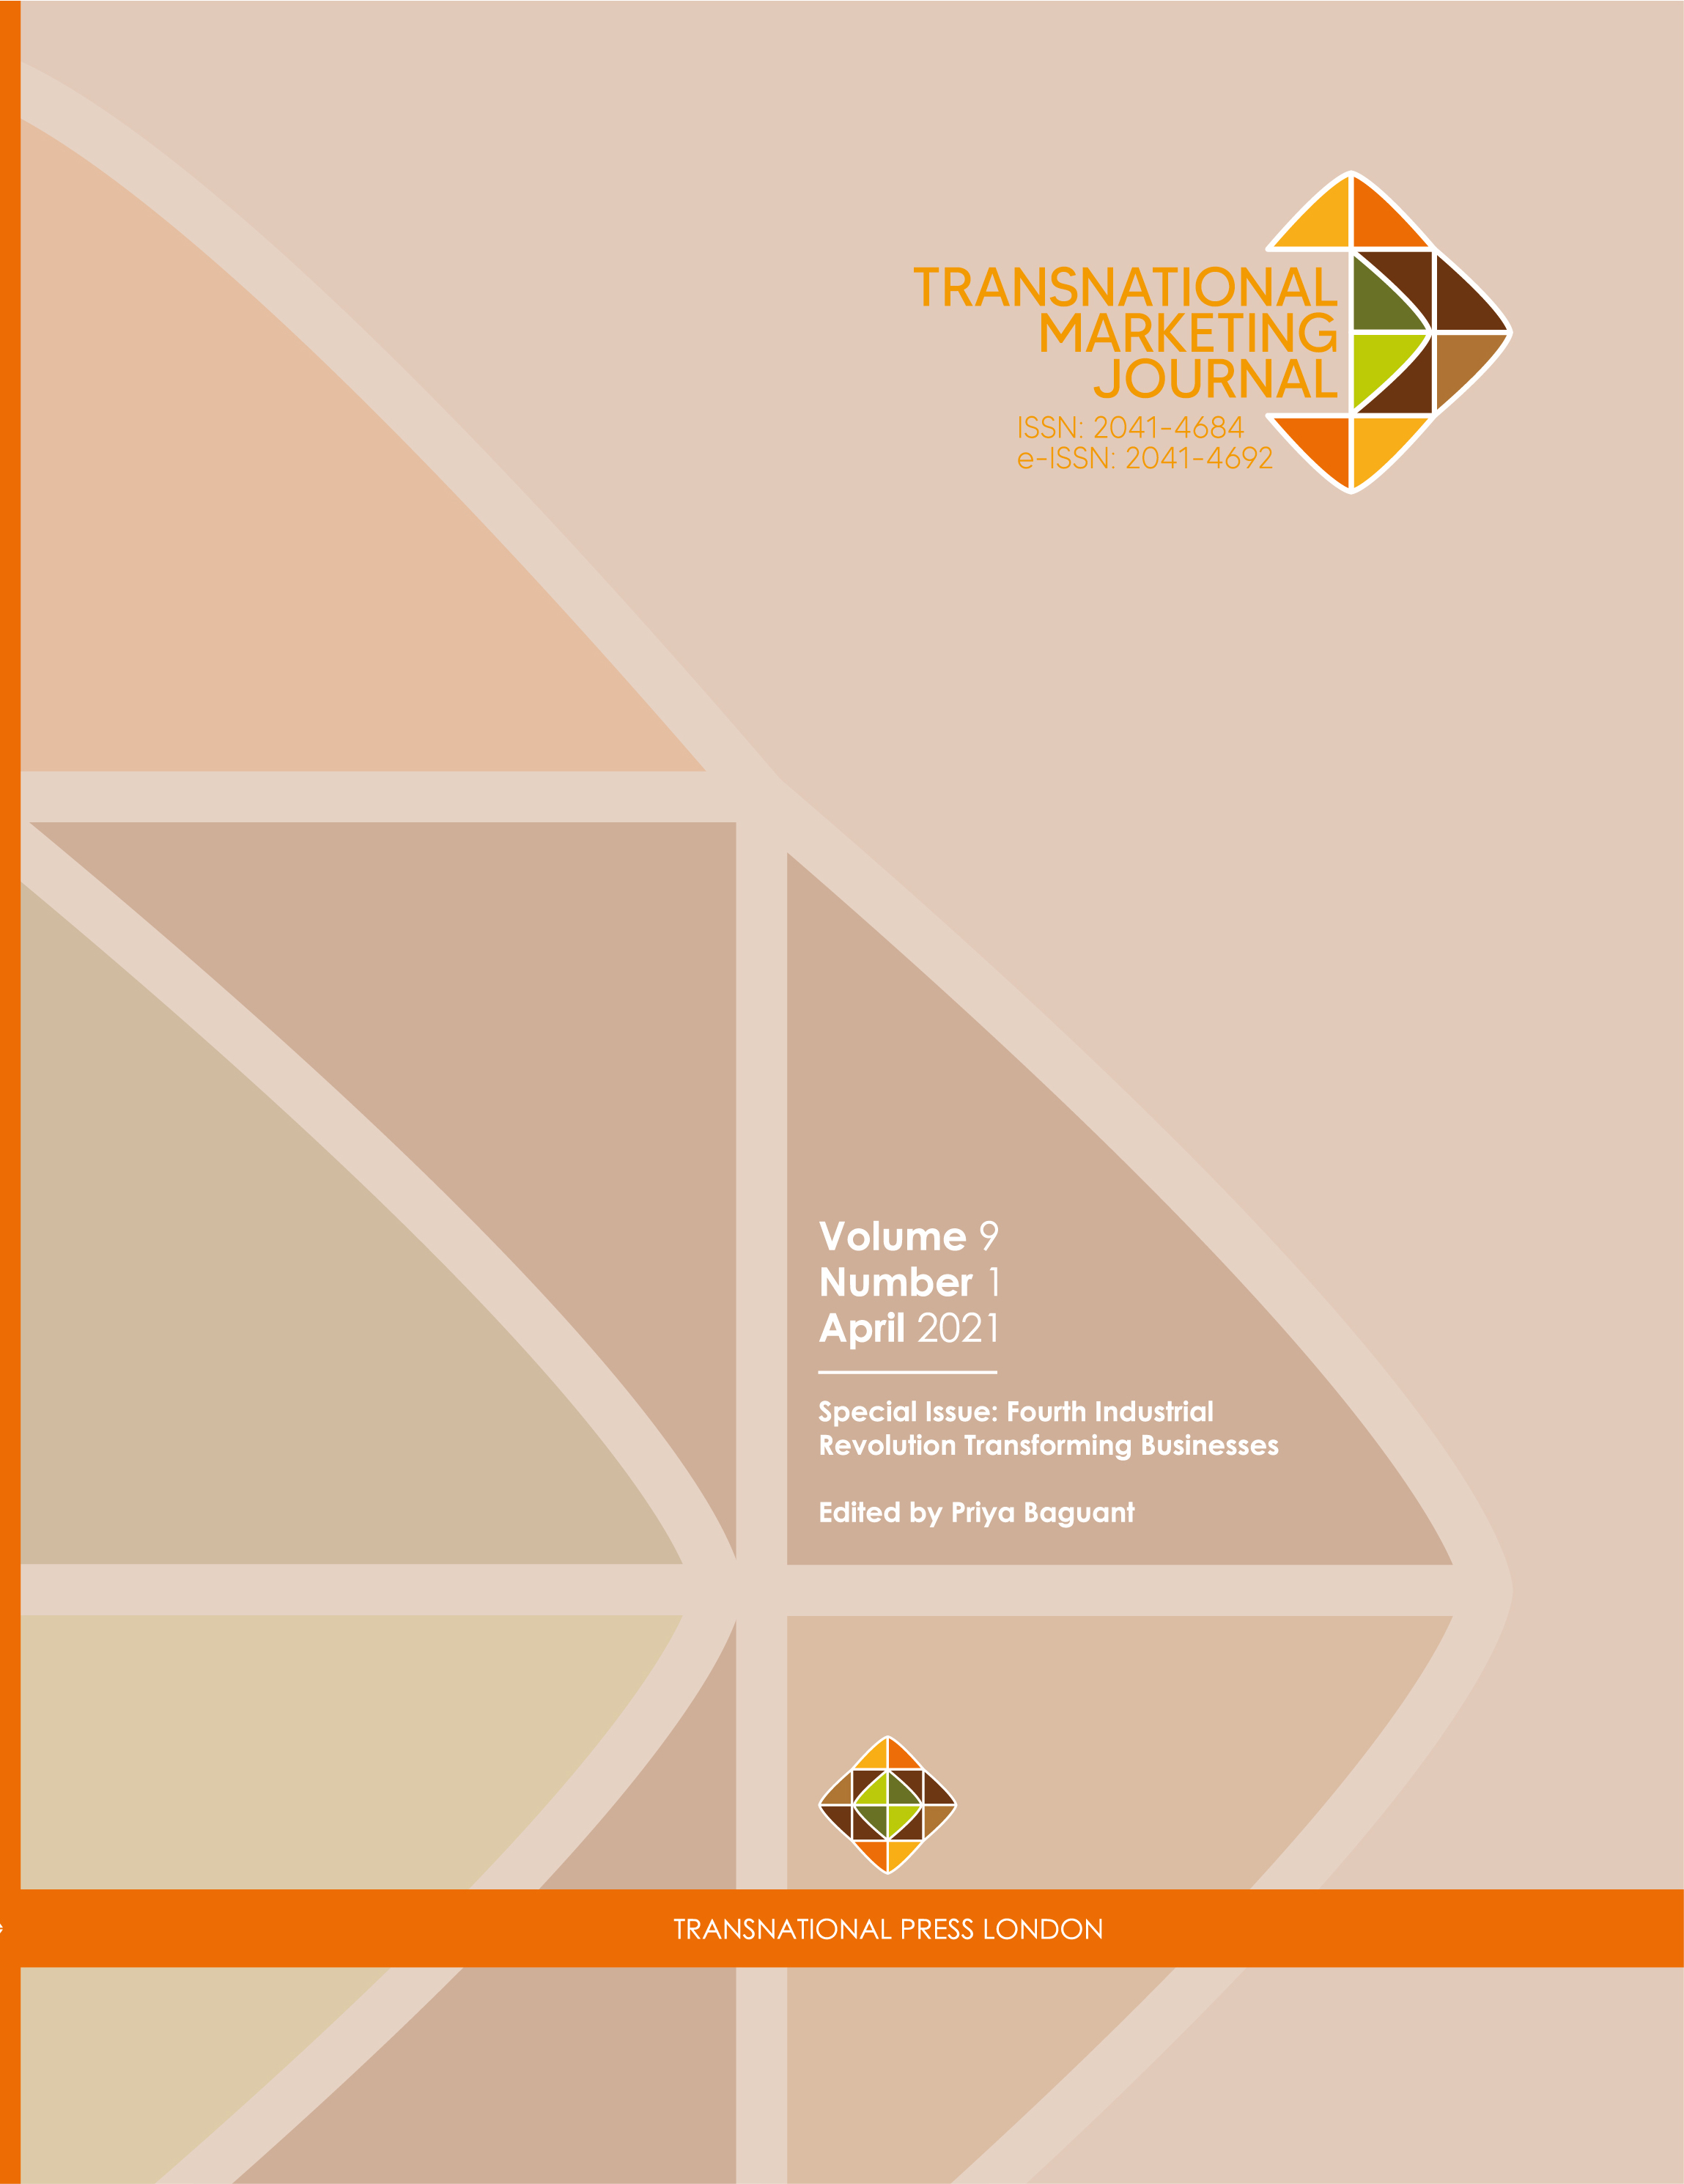 Transnational Marketing Journal - Vol9 - n1 - 2021